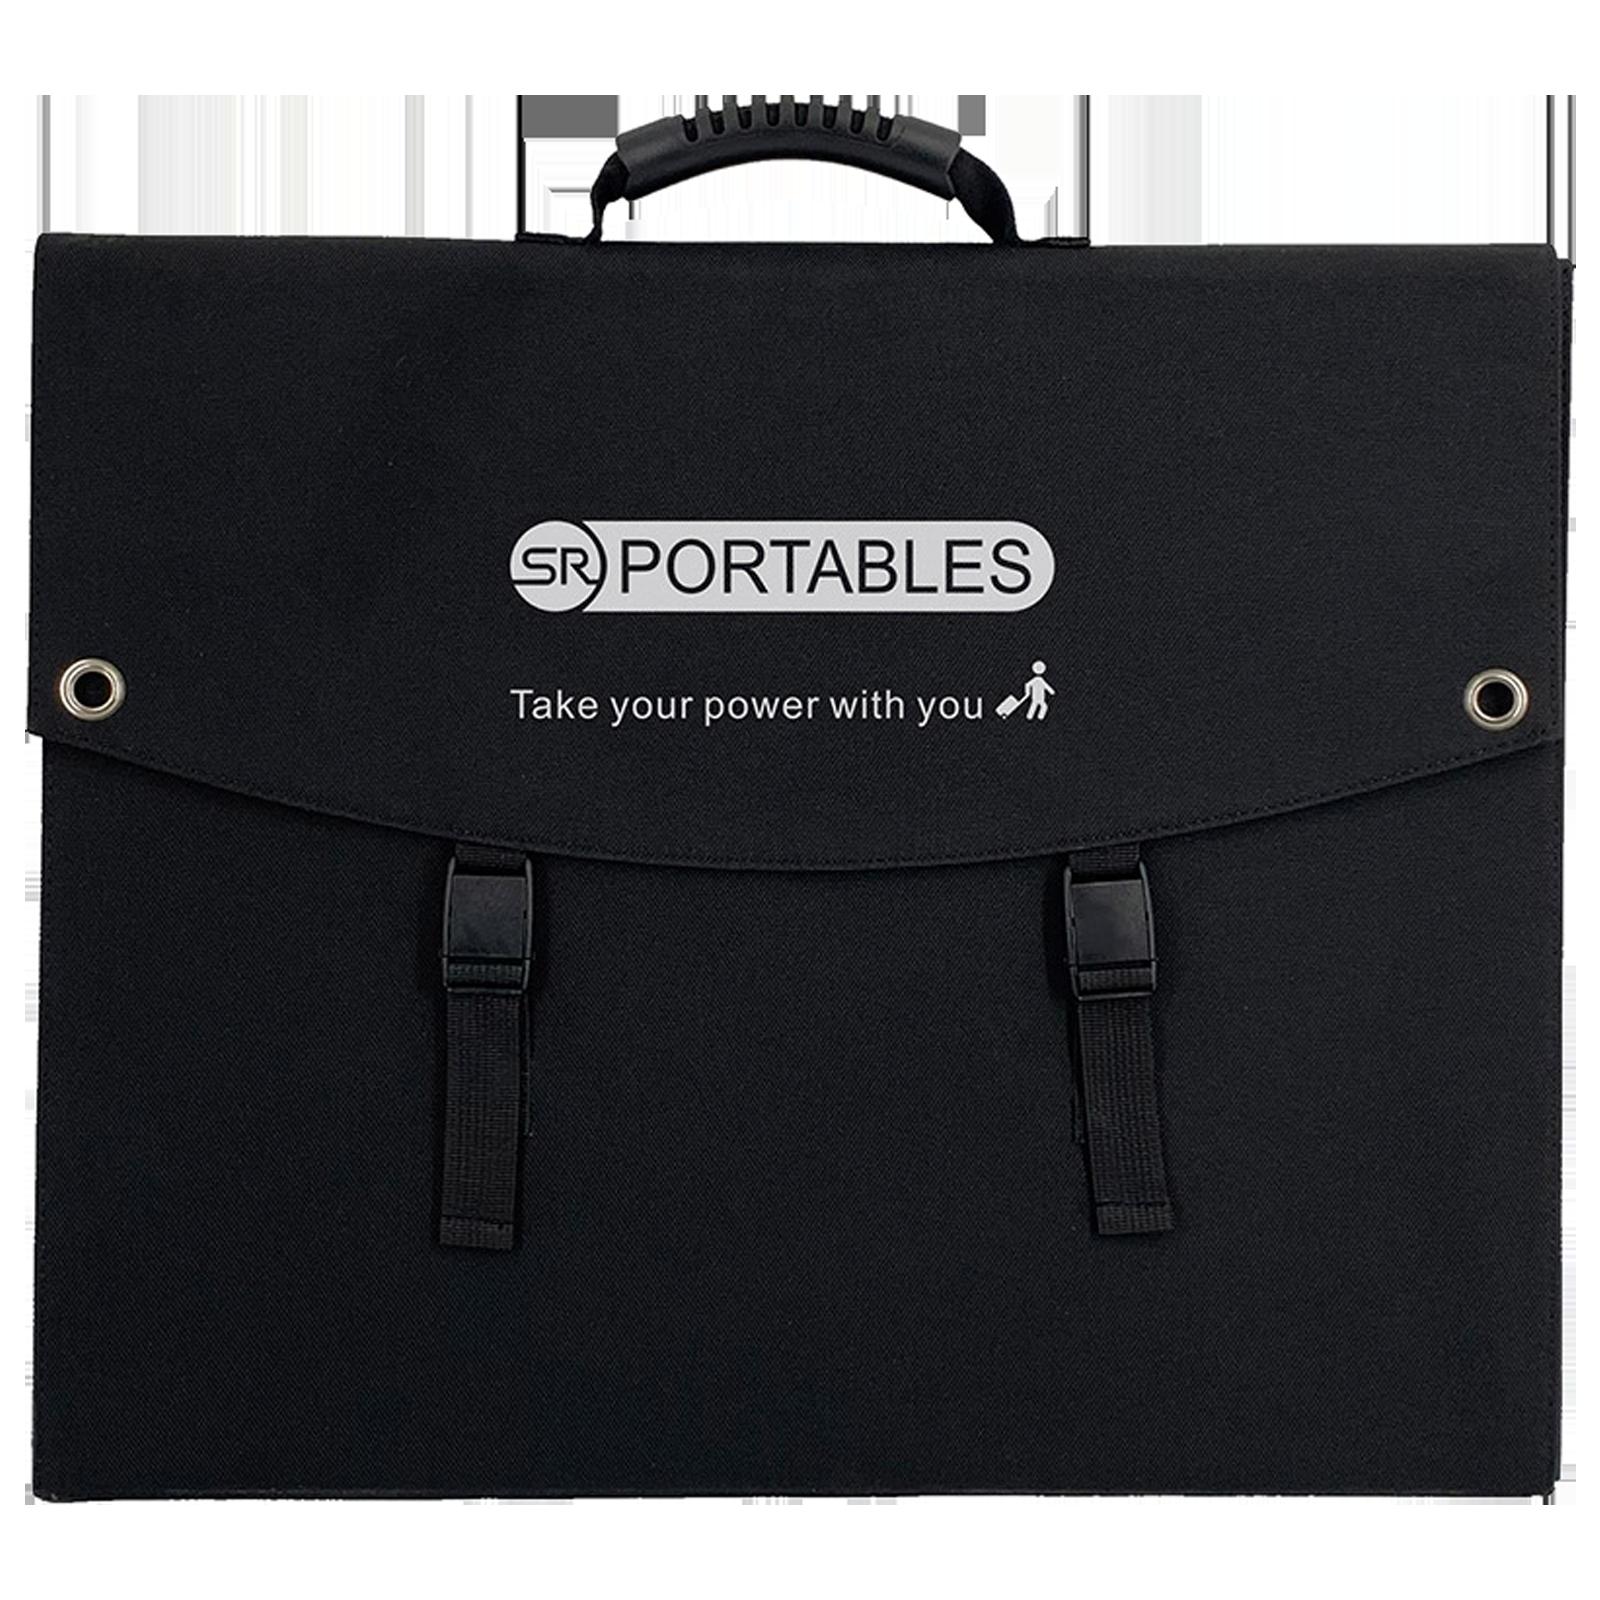 SR Portables 100 Watts Portable Solar Panel (Water Resistant, SRSOLPAN100, Black)_1